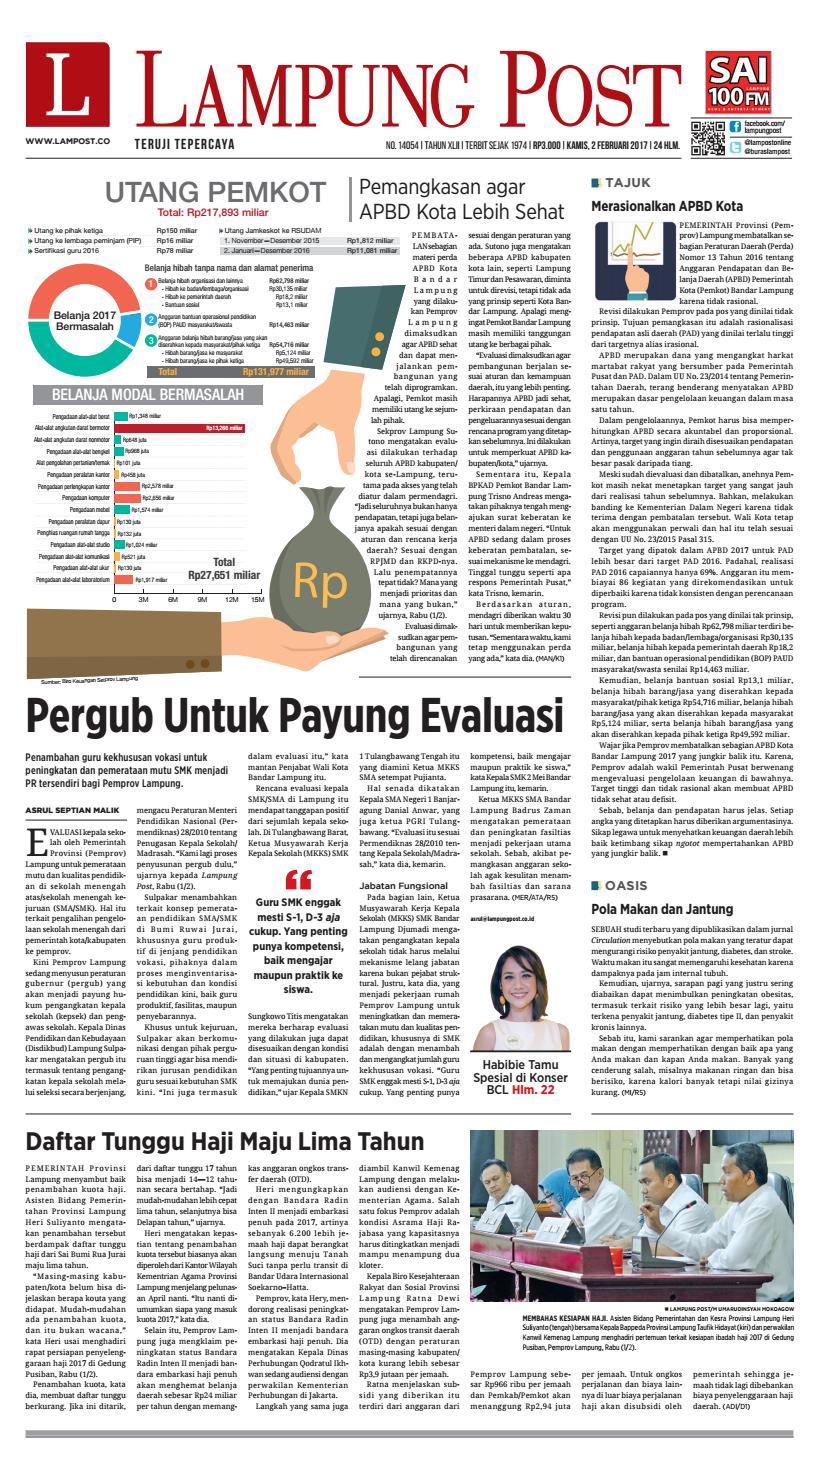 Lampung Post Kamis 2 Februari 2017 By Issuu Produk Ukm Bumn Outer Pendek Ijo Coklat Berkerah